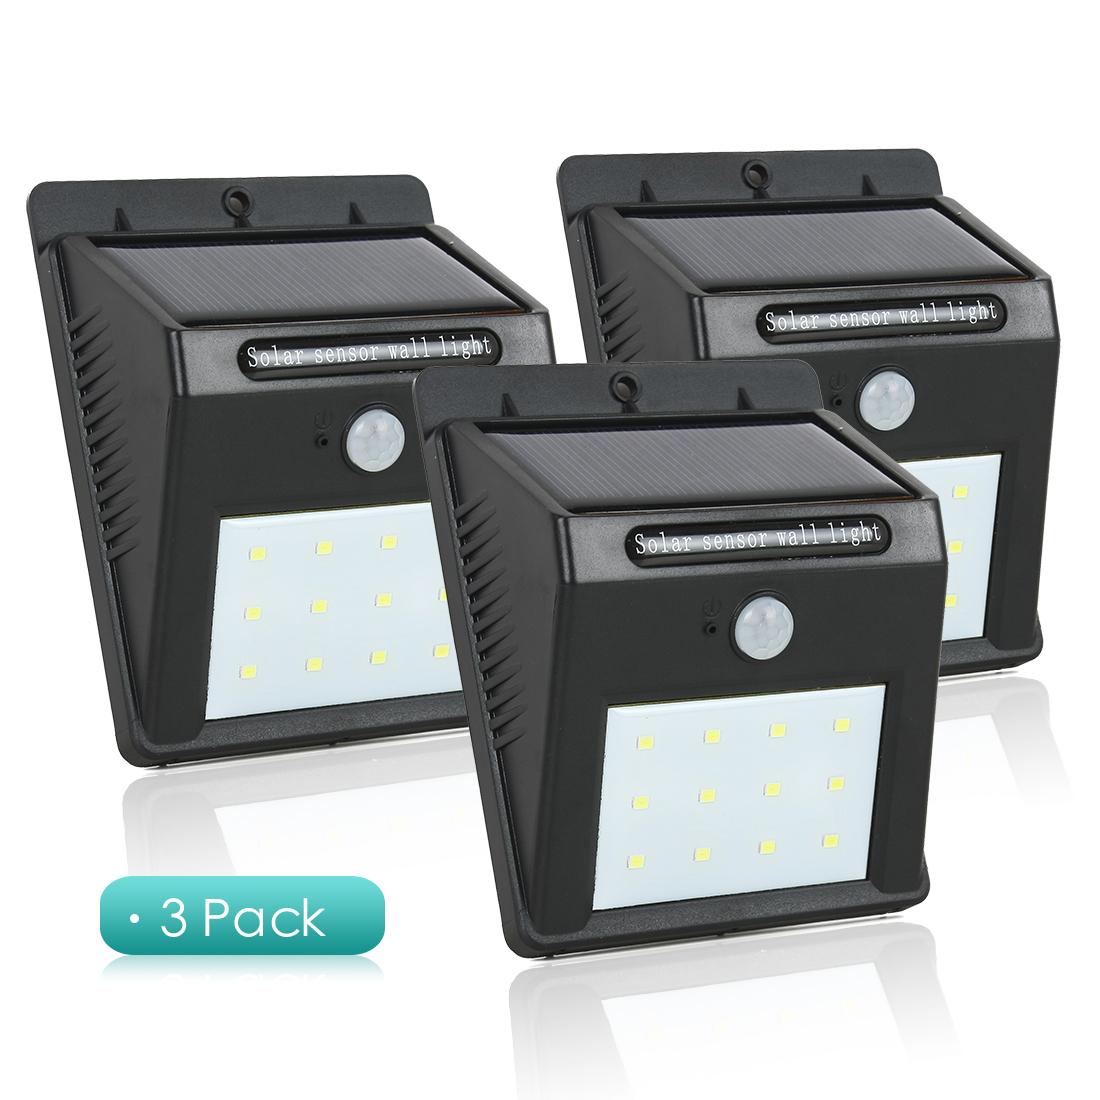 3pcs LED Solar Light PIR CDS Motion Sensor Lamp 12 LEDs 80lm Waterproof Wireless